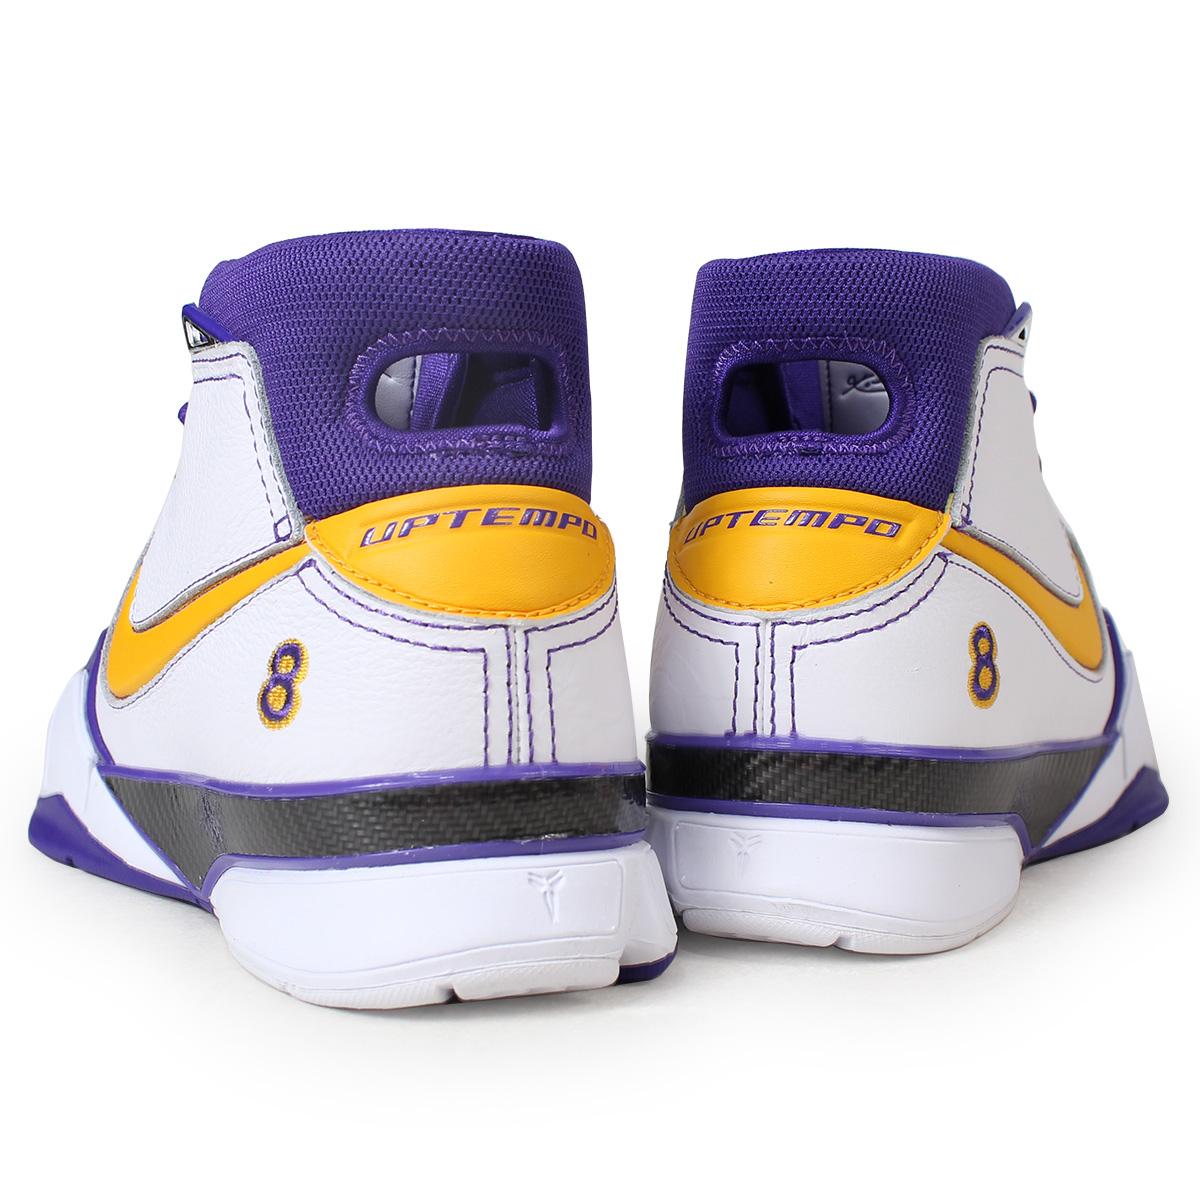 f41f3b929ec0 NIKE Nike Corby sneakers men ZOOM KOBE 1 PROTRO FINAL SECONDS AQ2728-101  white